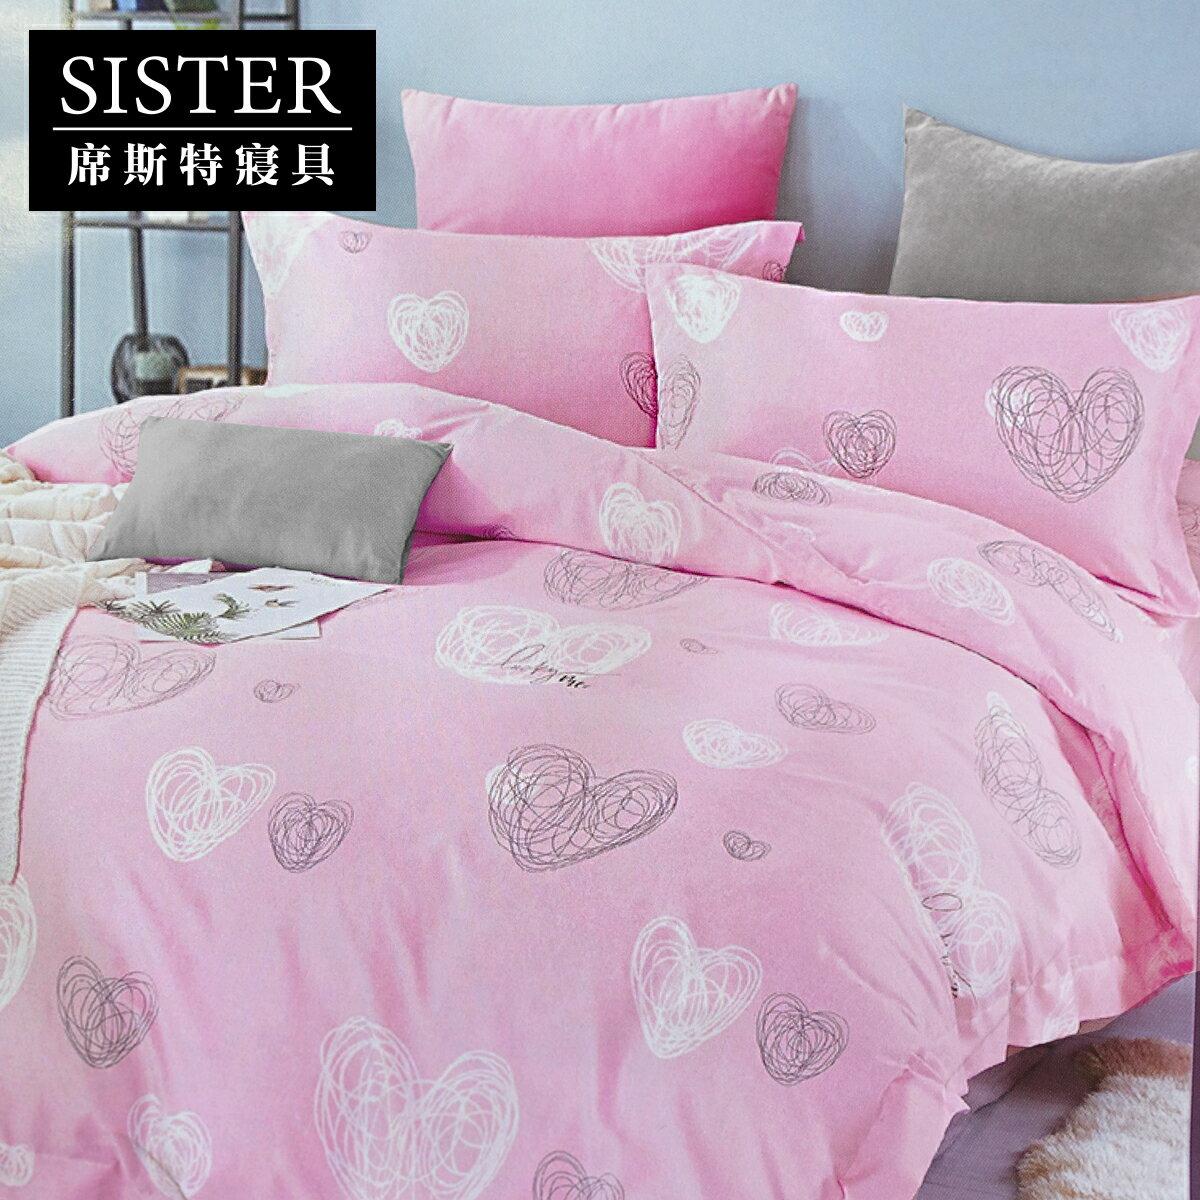 【SISTER席斯特】粉紅甜心 床包枕套兩件組-單人